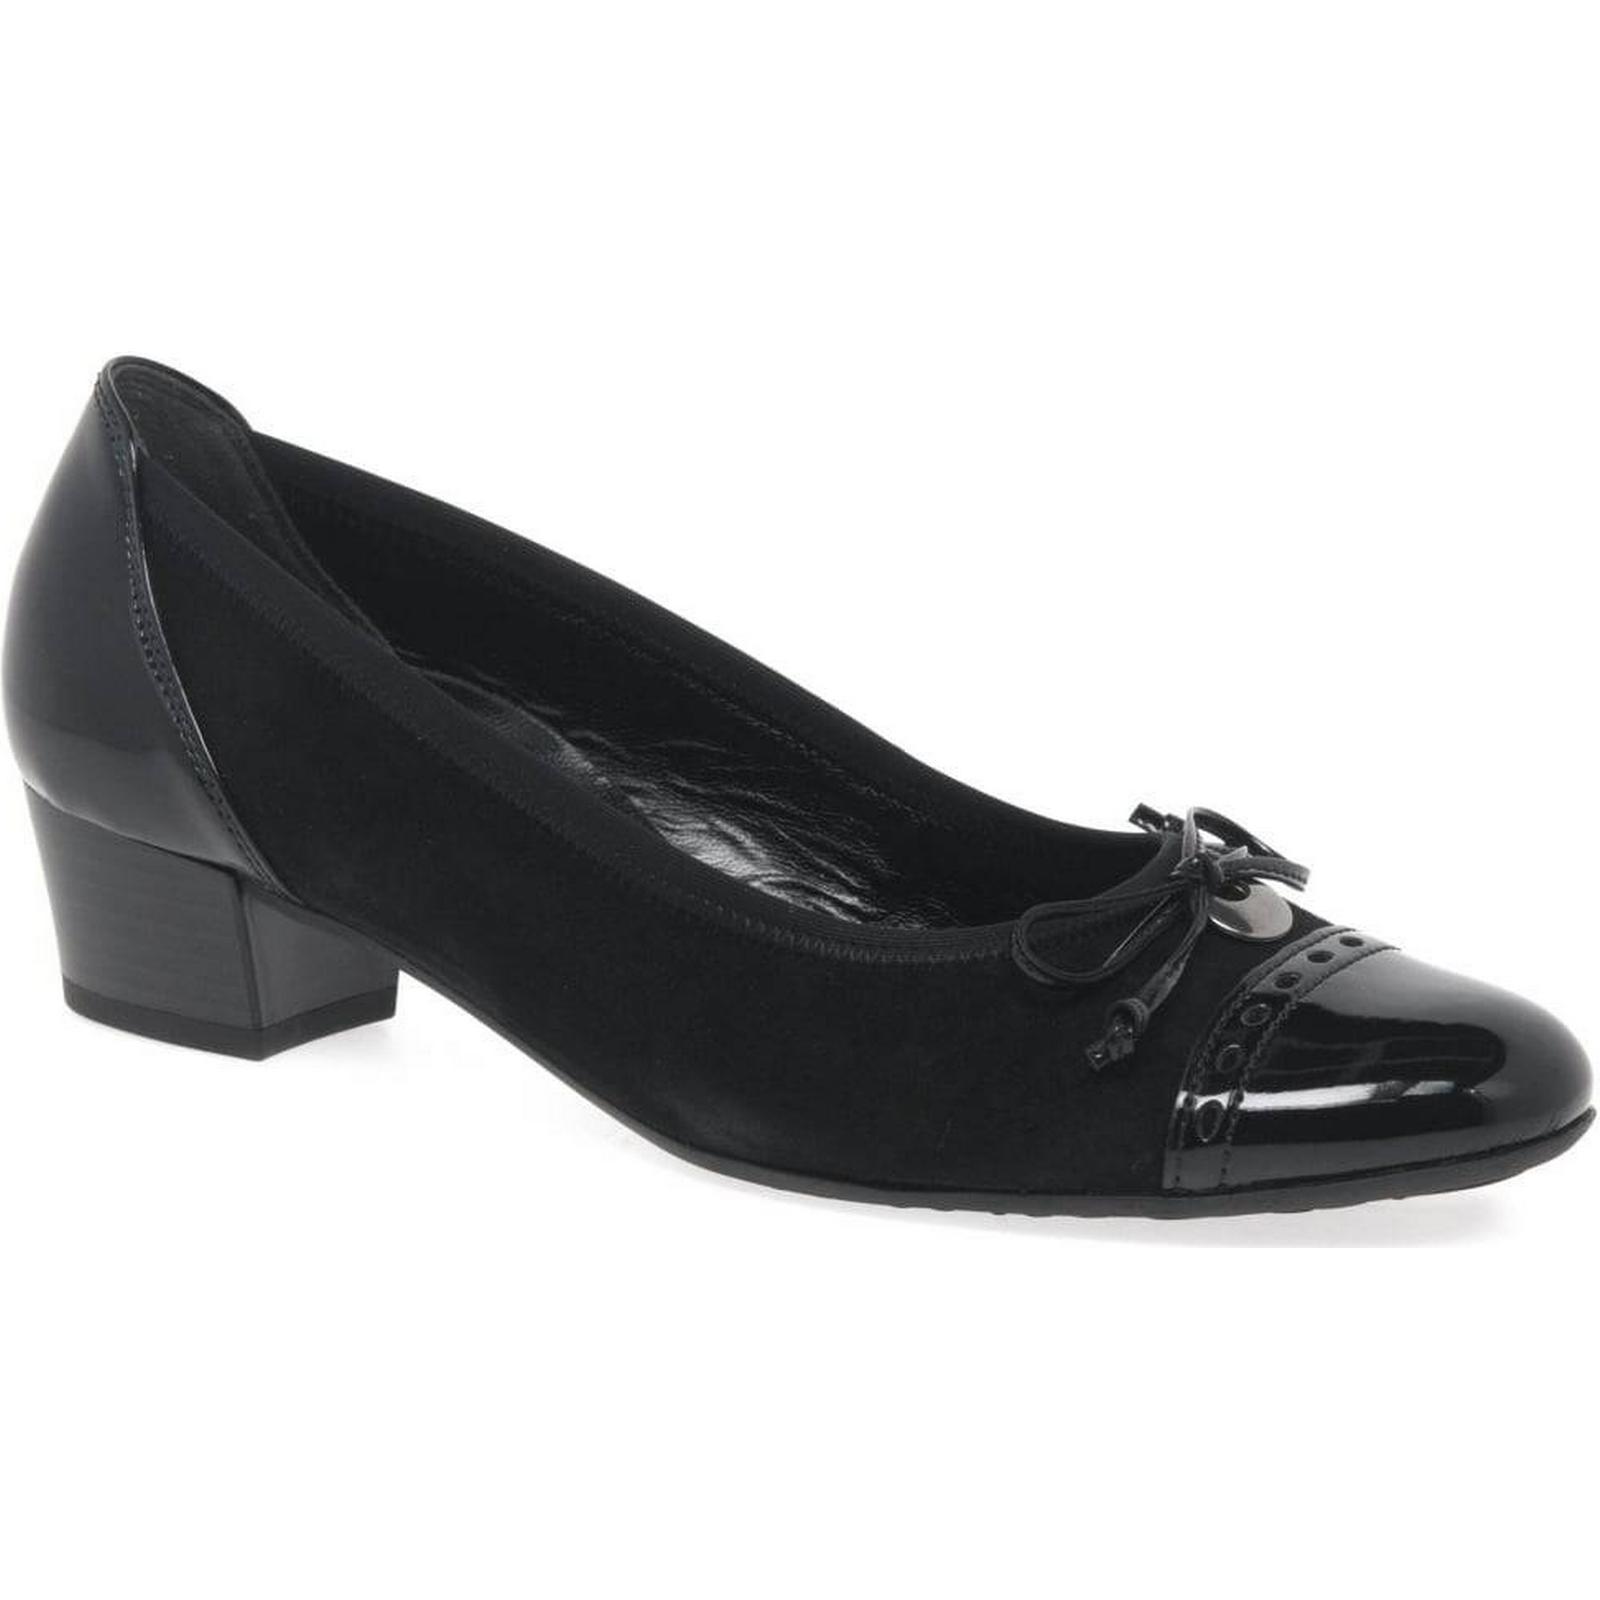 Gabor Islay Black Womens Casual Shoes Colour: Black Islay Suede/Patent, Size: 5 e5c2e0